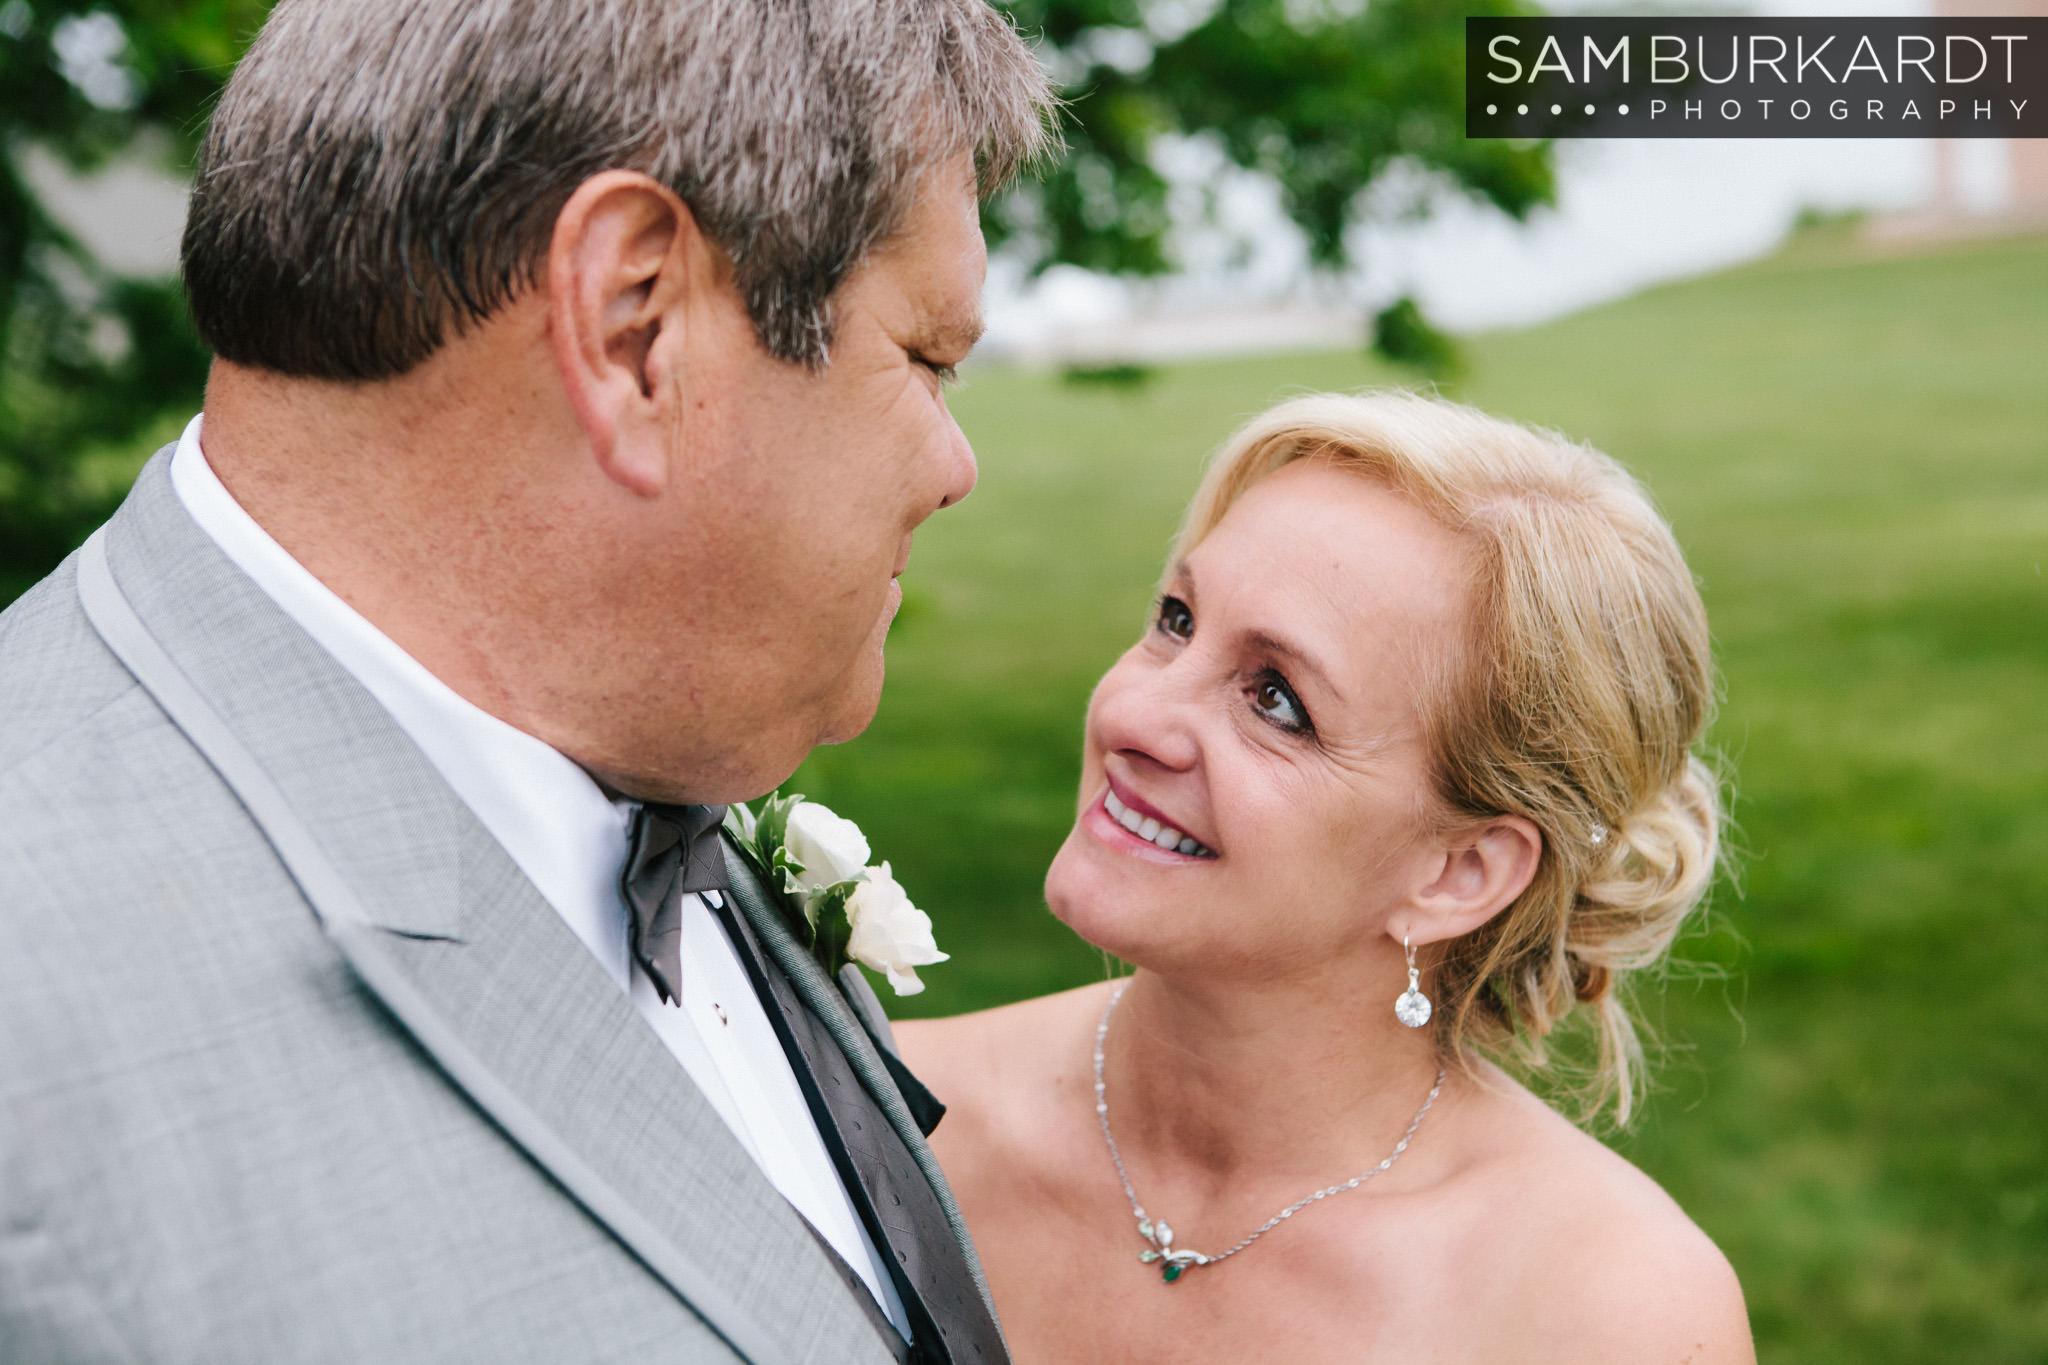 samburkardt_branford_house_groton_connecticut_wedding_0045.jpg